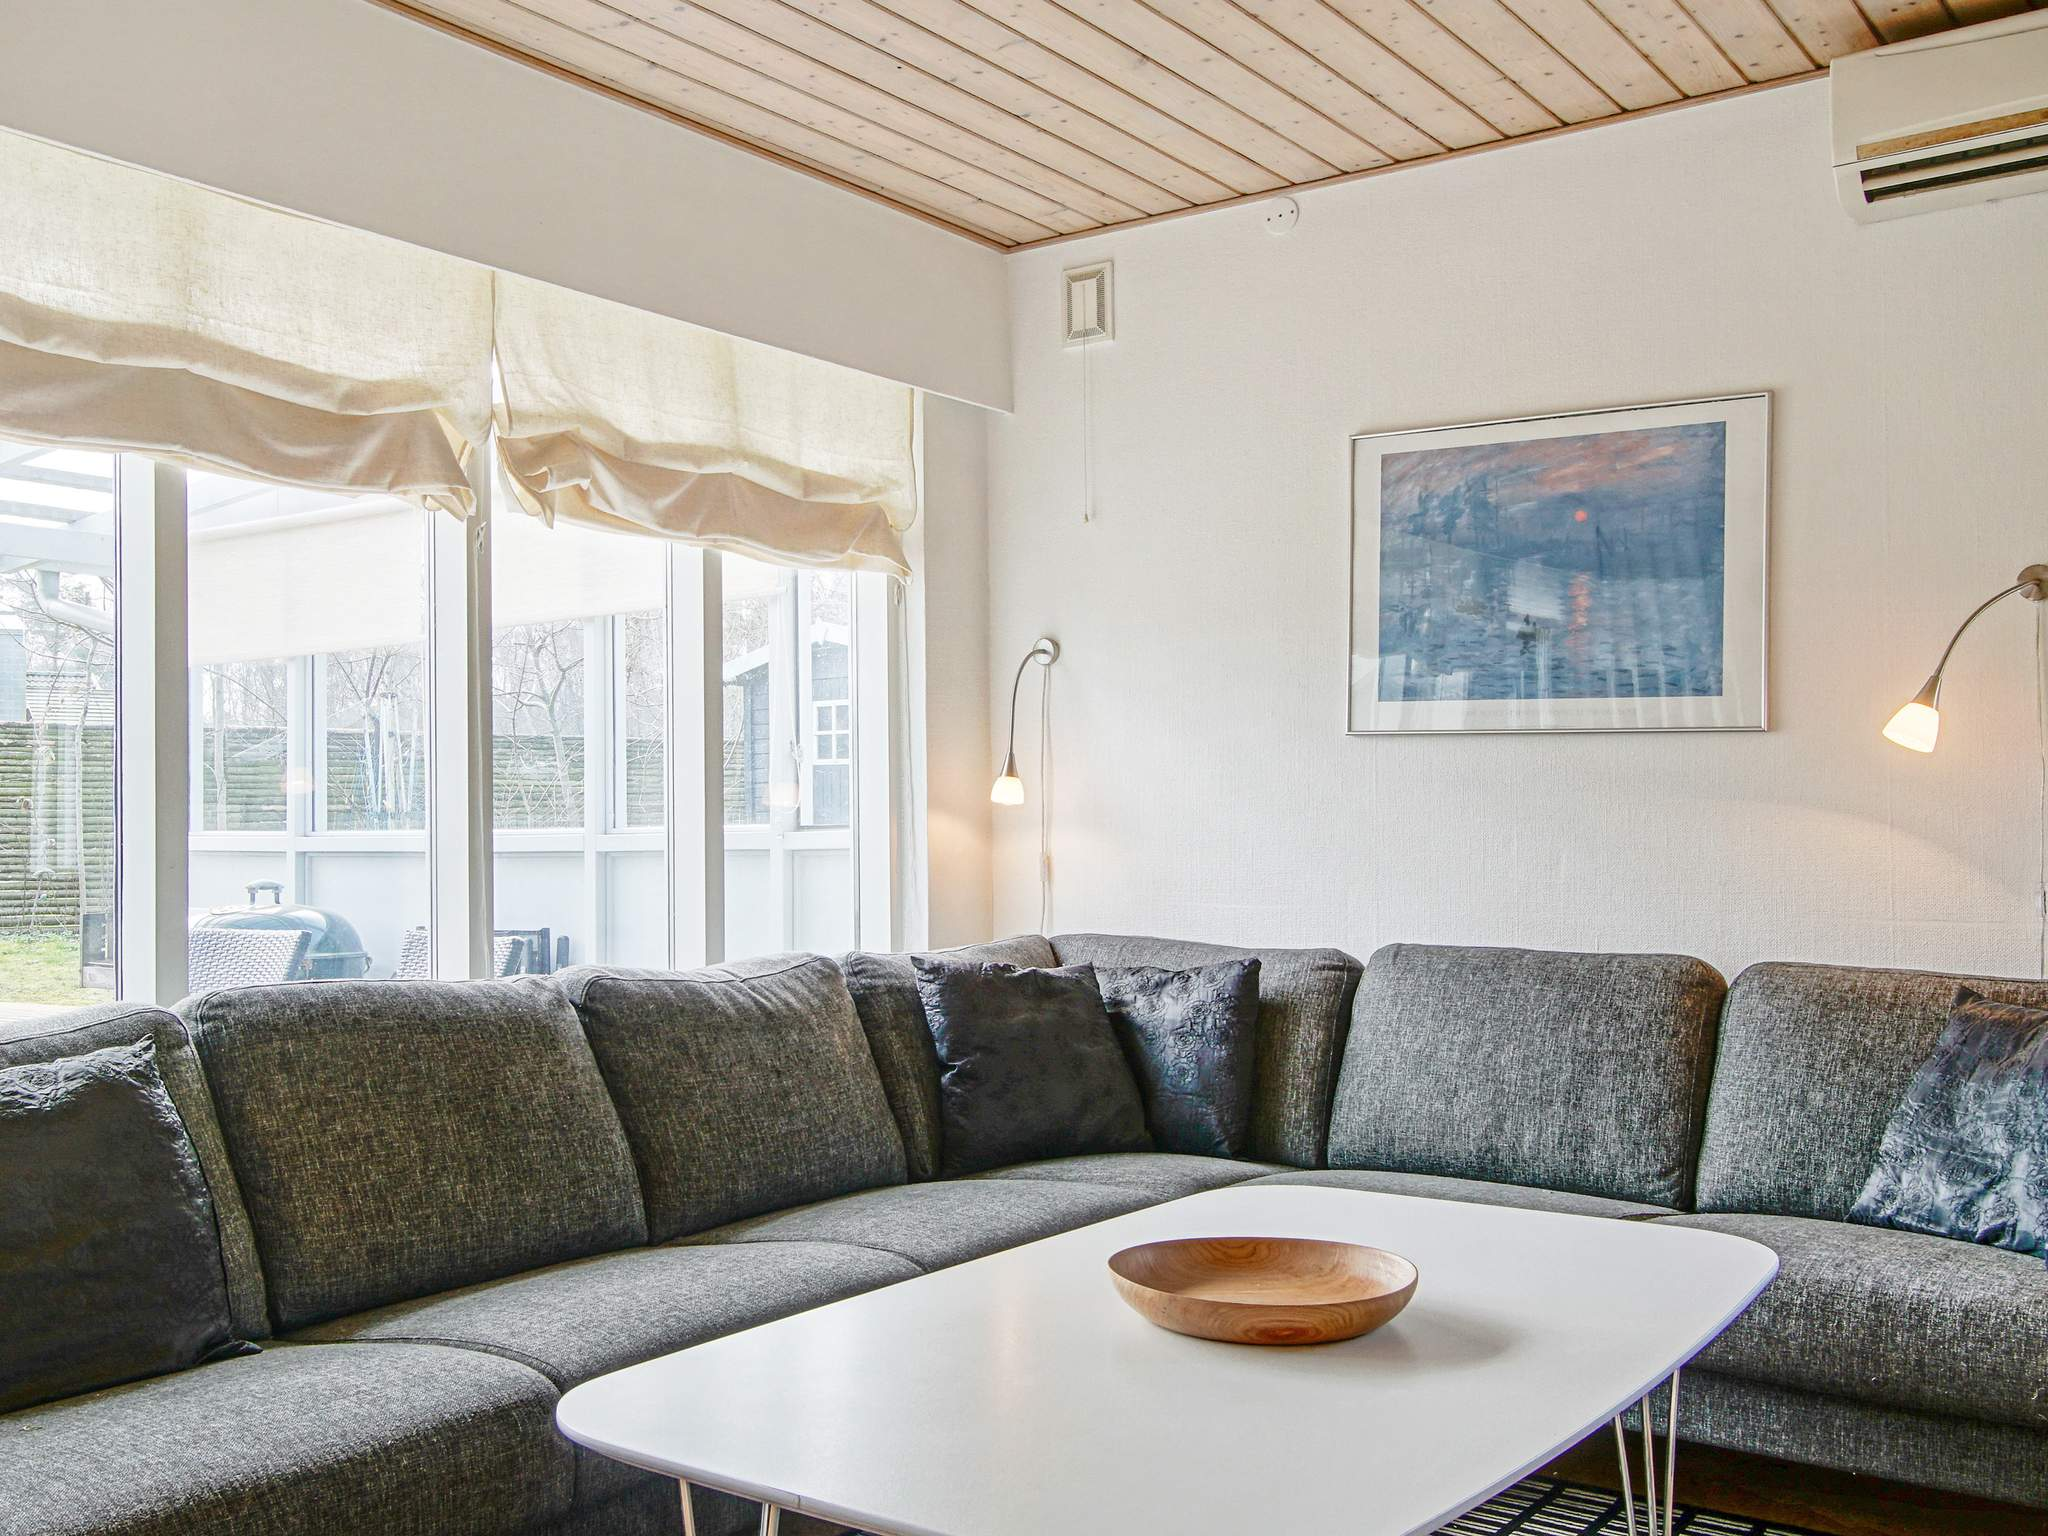 Ferienhaus Balka Strand (82287), Balke, , Bornholm, Dänemark, Bild 12